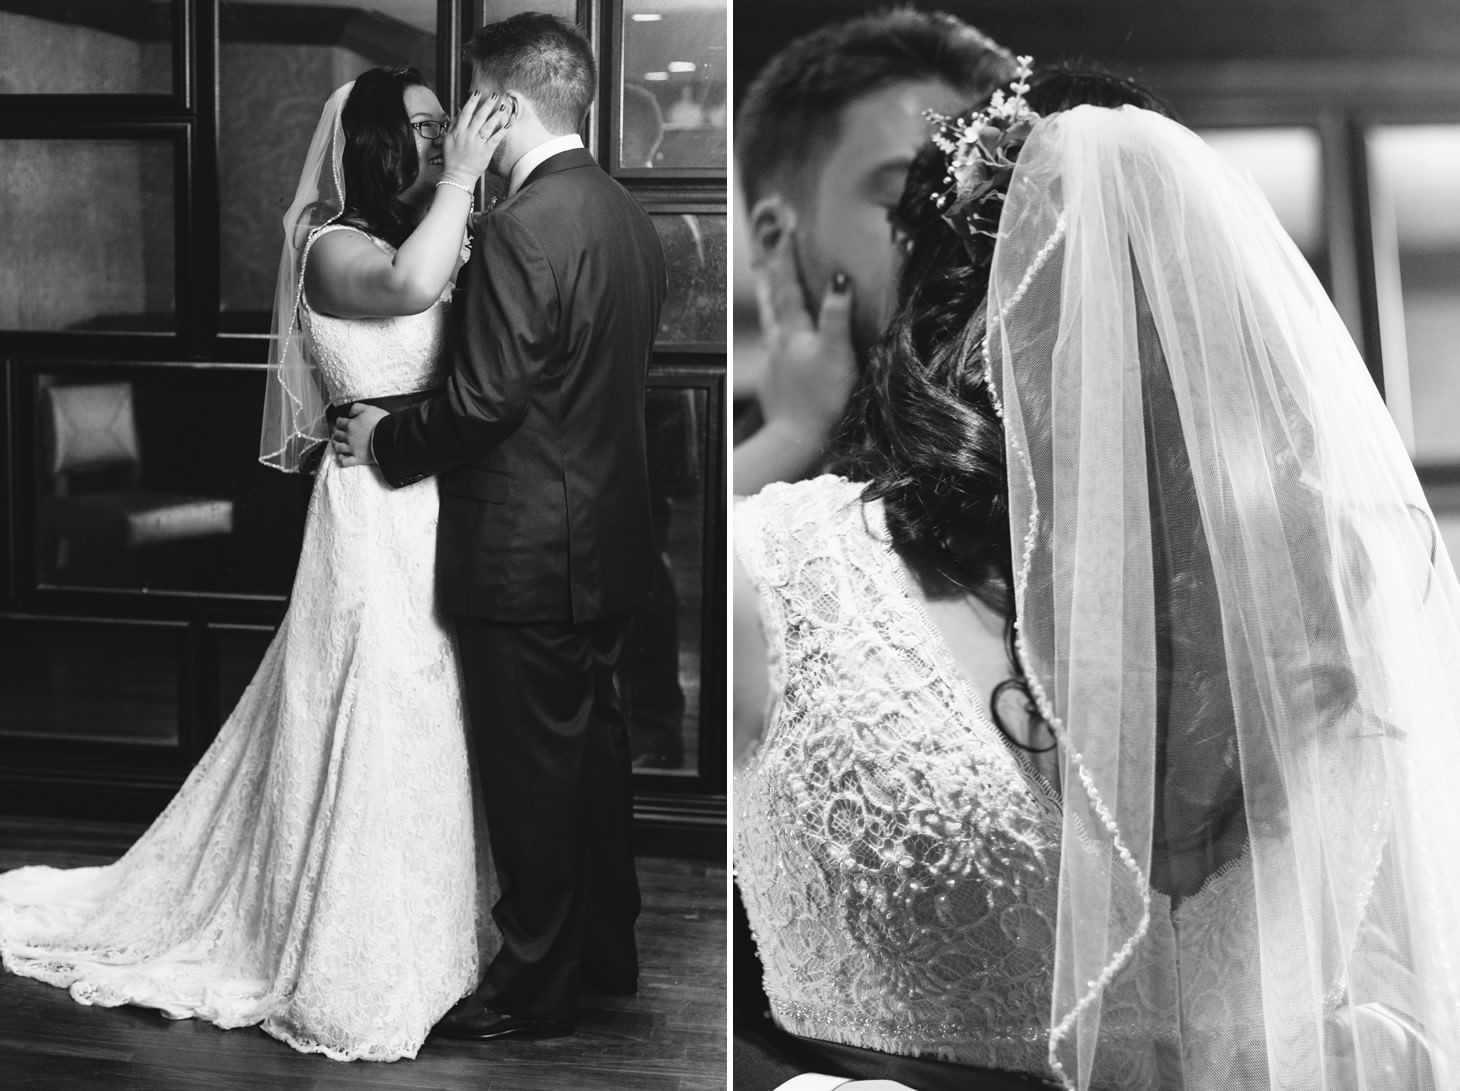 019-nyc-wedding-portrait-photographer-times-square-muse-hotel-winter-wedding-smitten-chickens.jpg